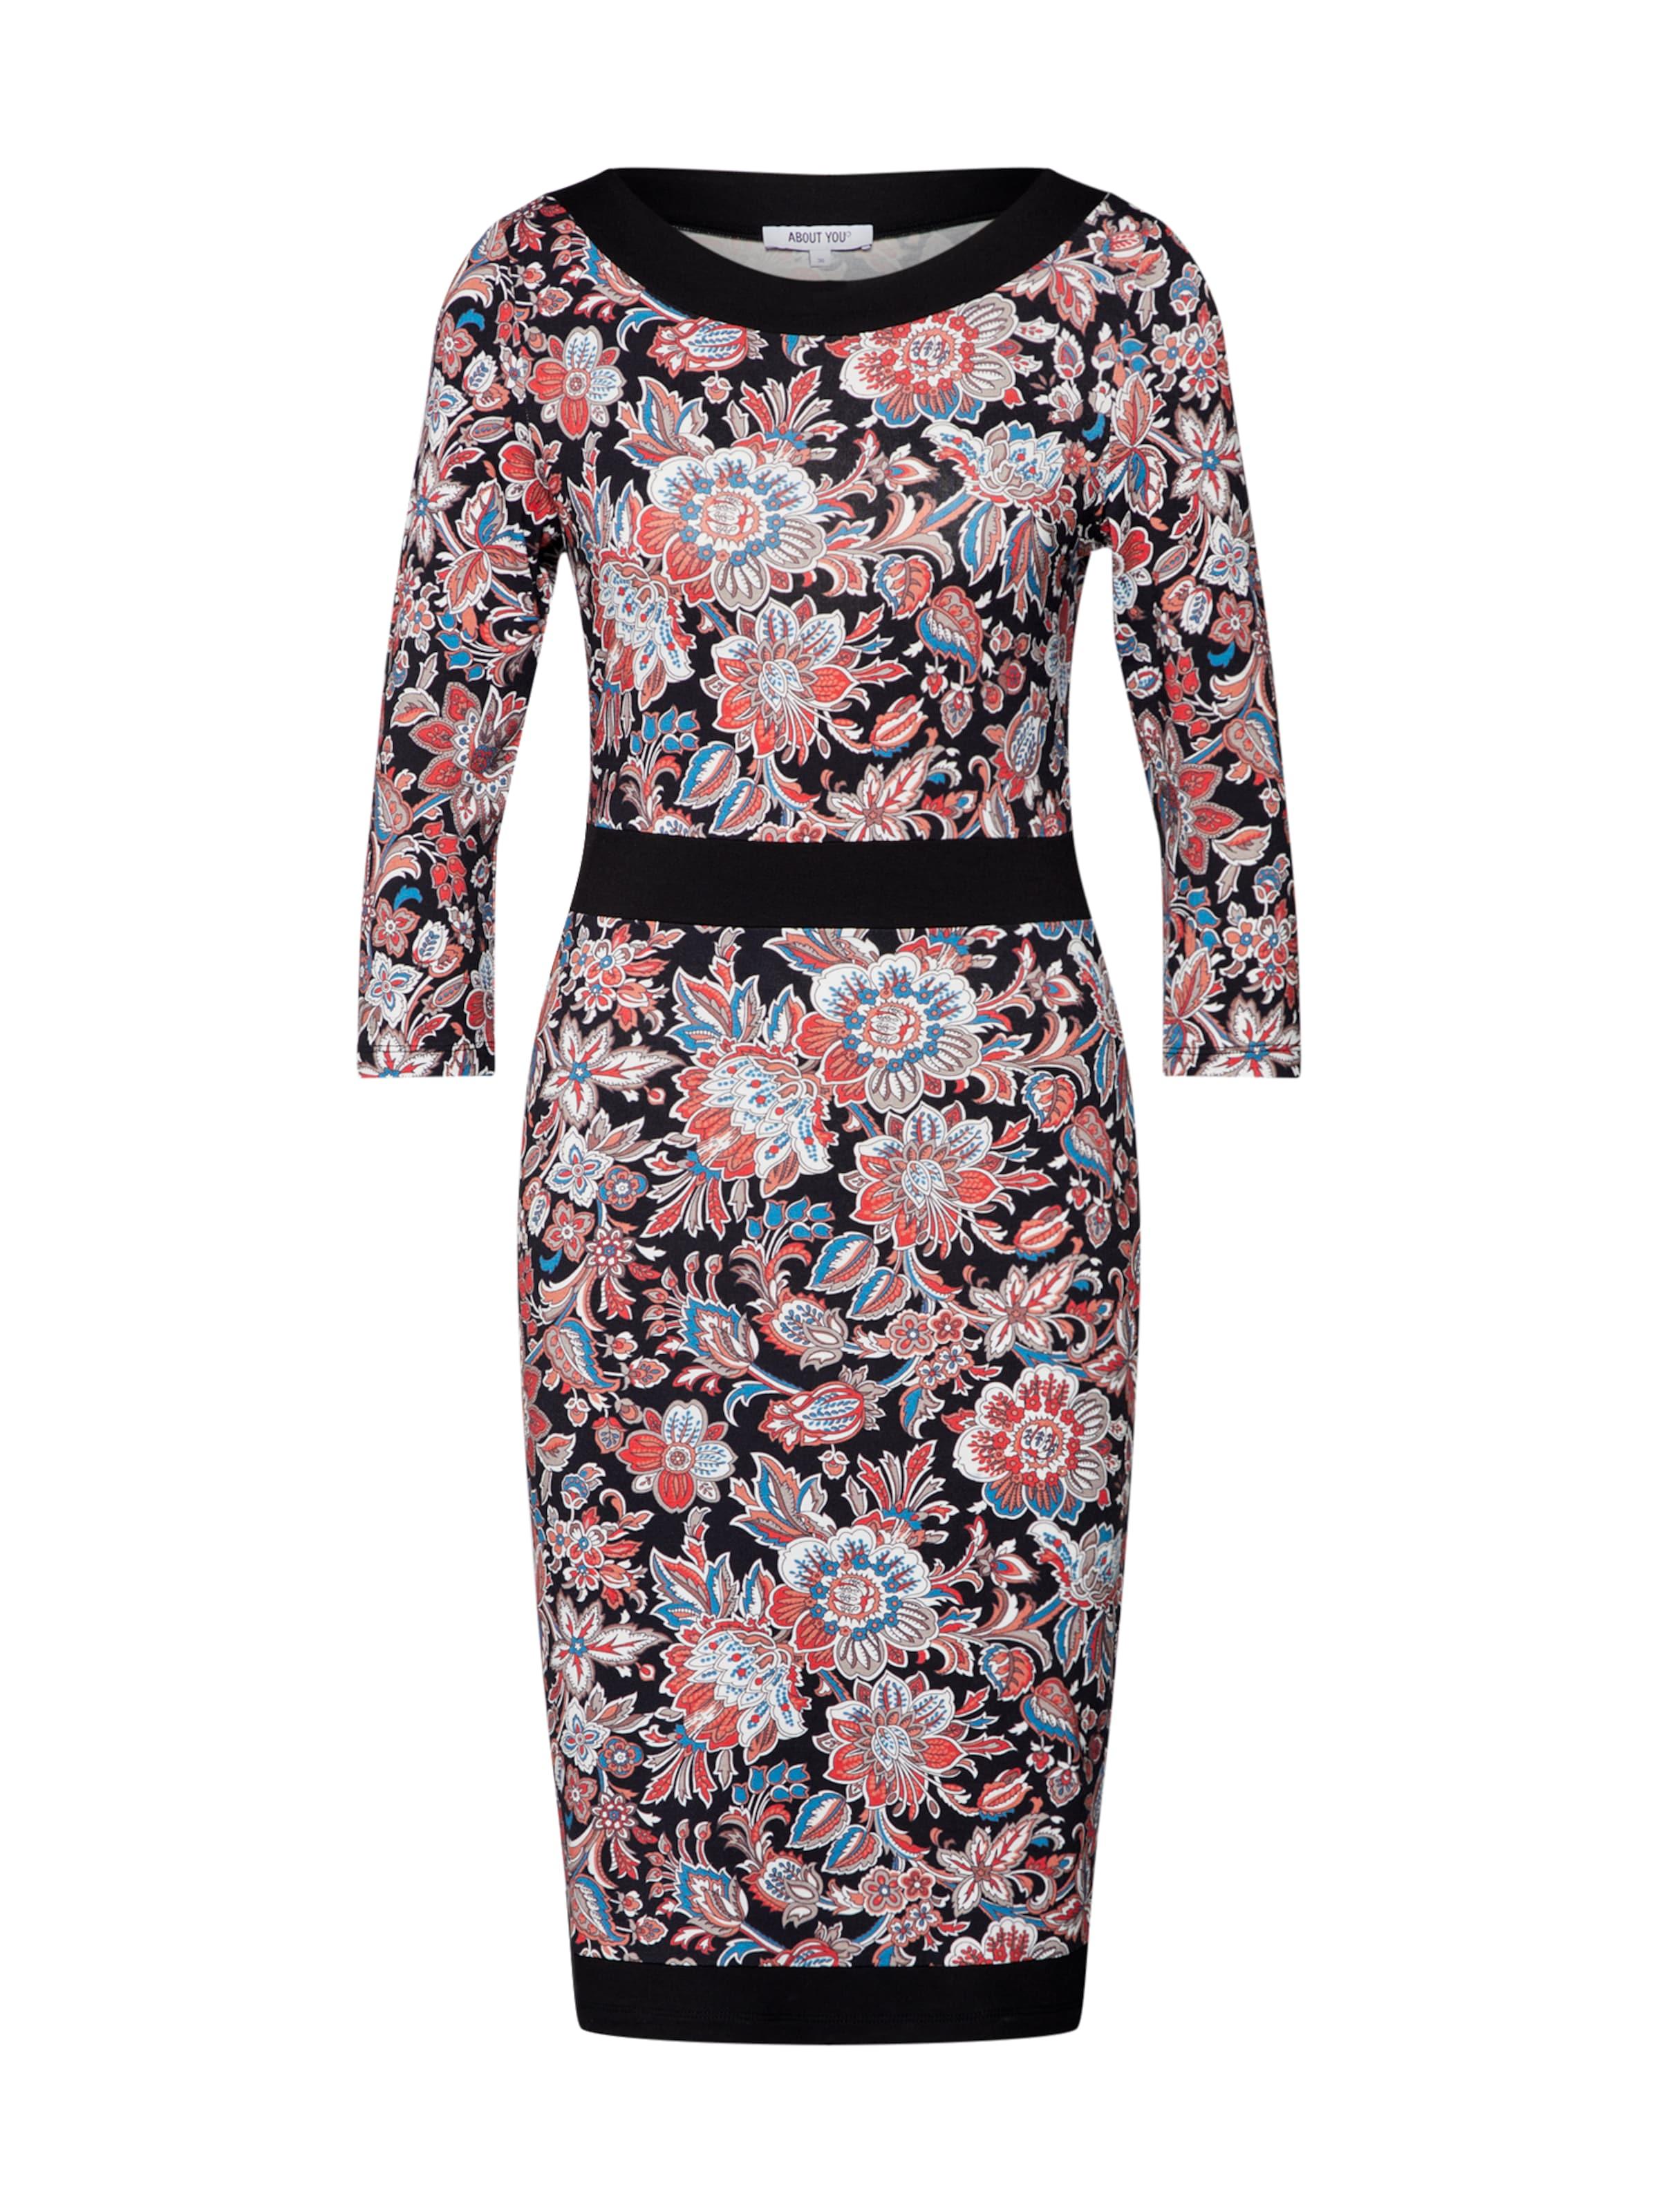 You Noir About Dress' 'isabella BleuRouge En Robe v76IYfgyb